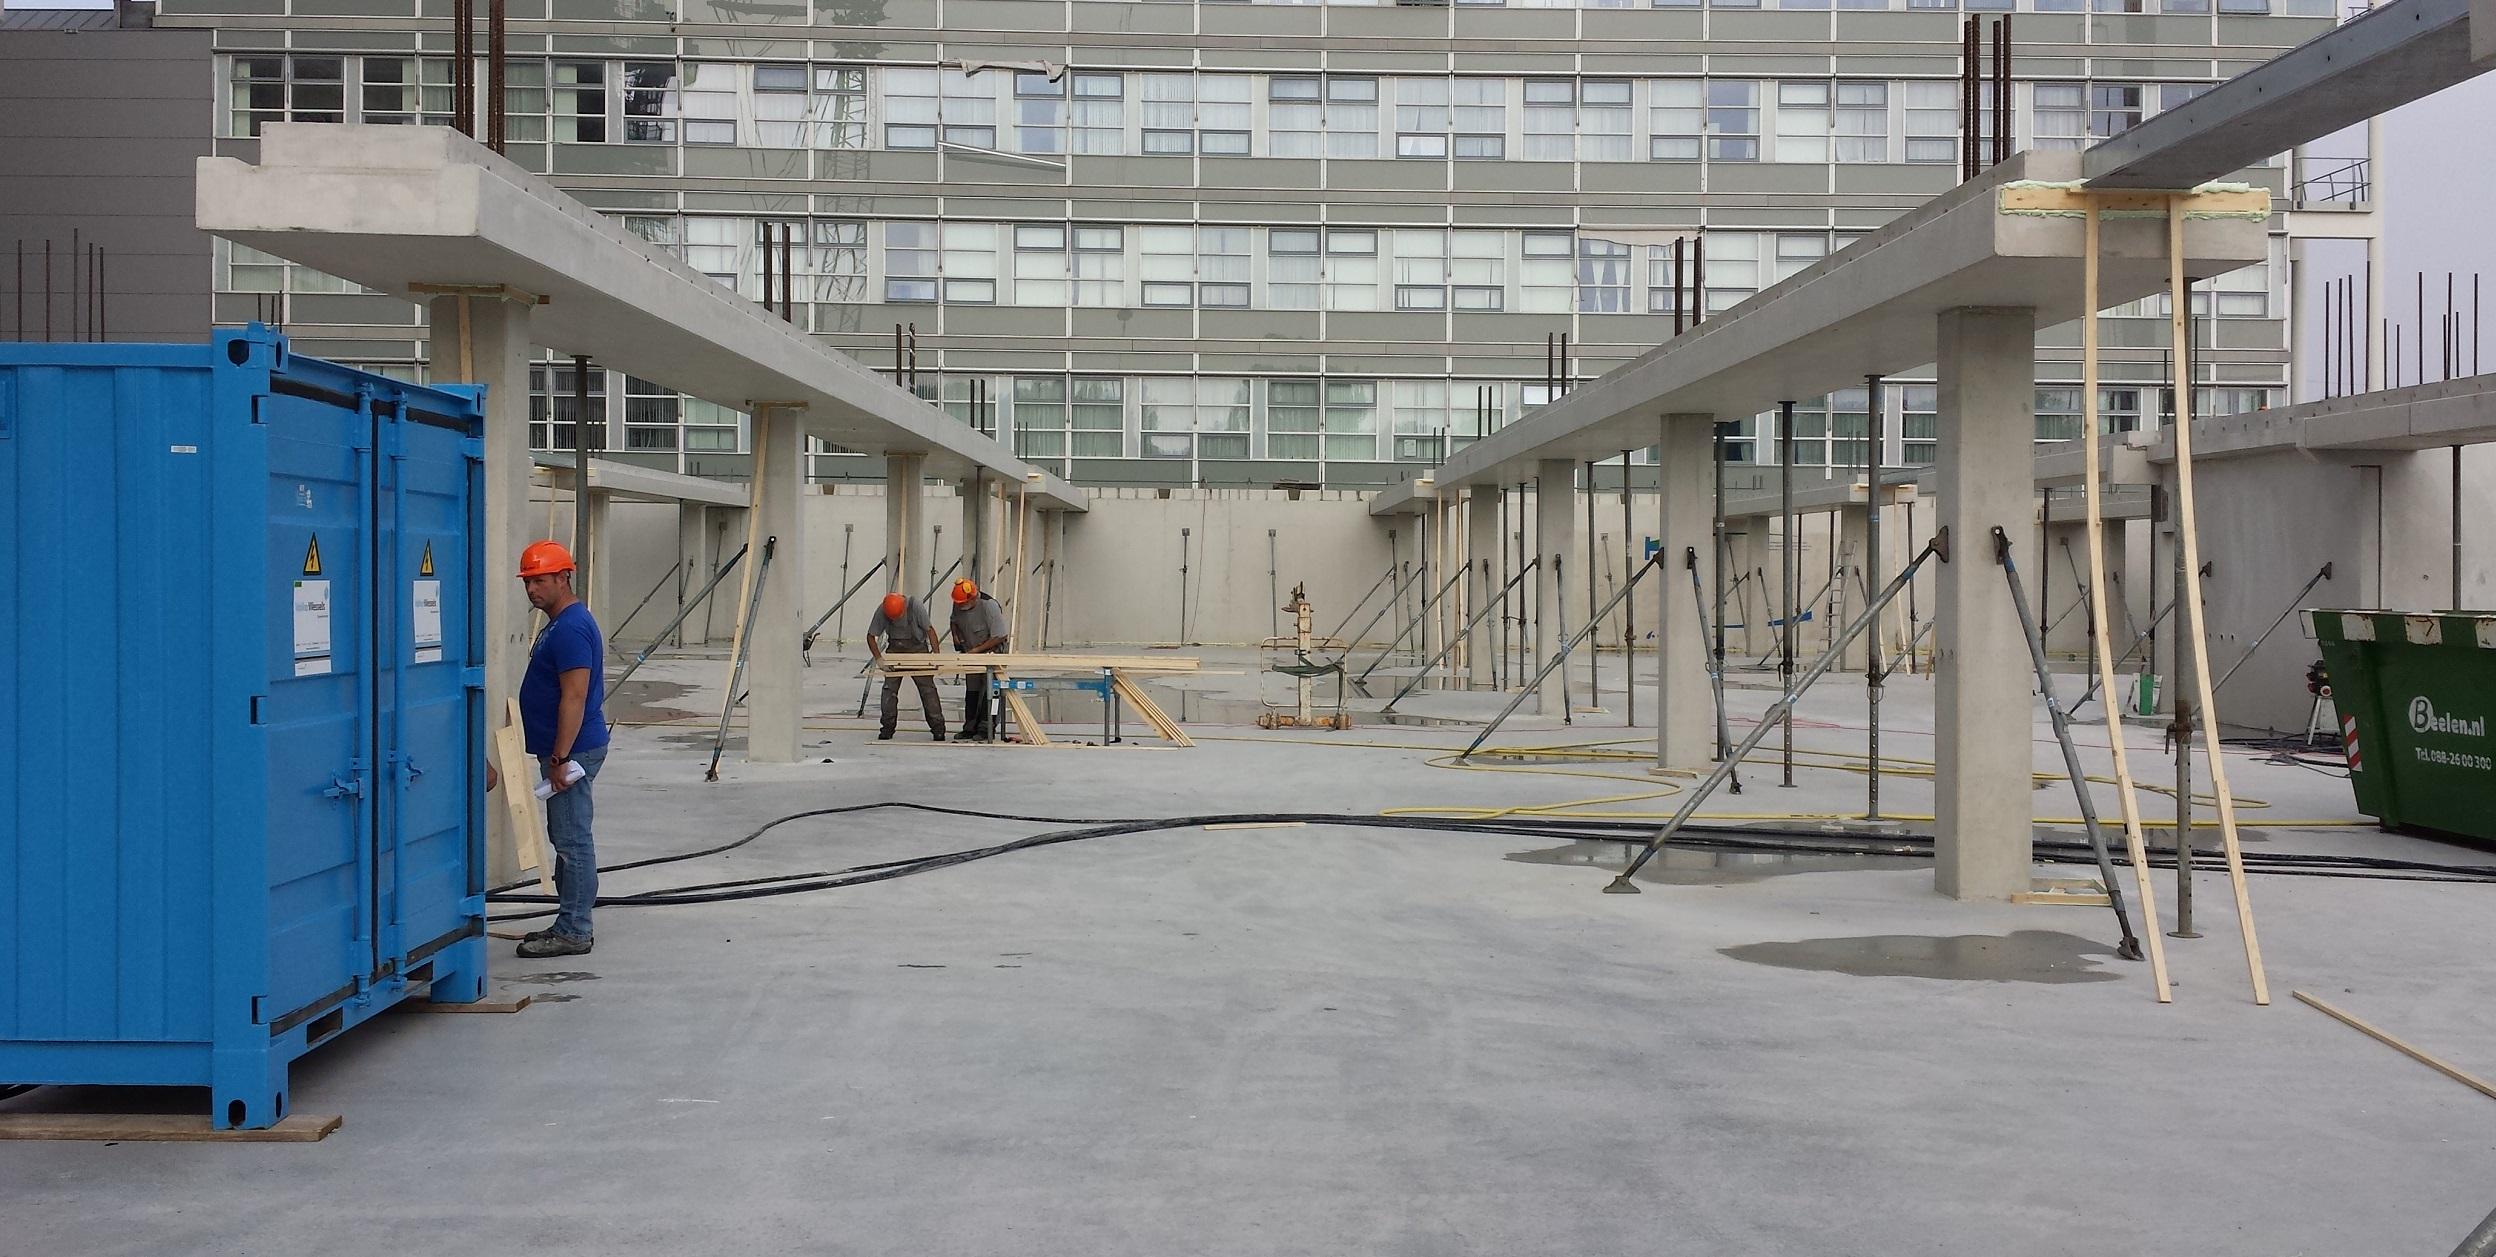 Cascobouw Den Haag